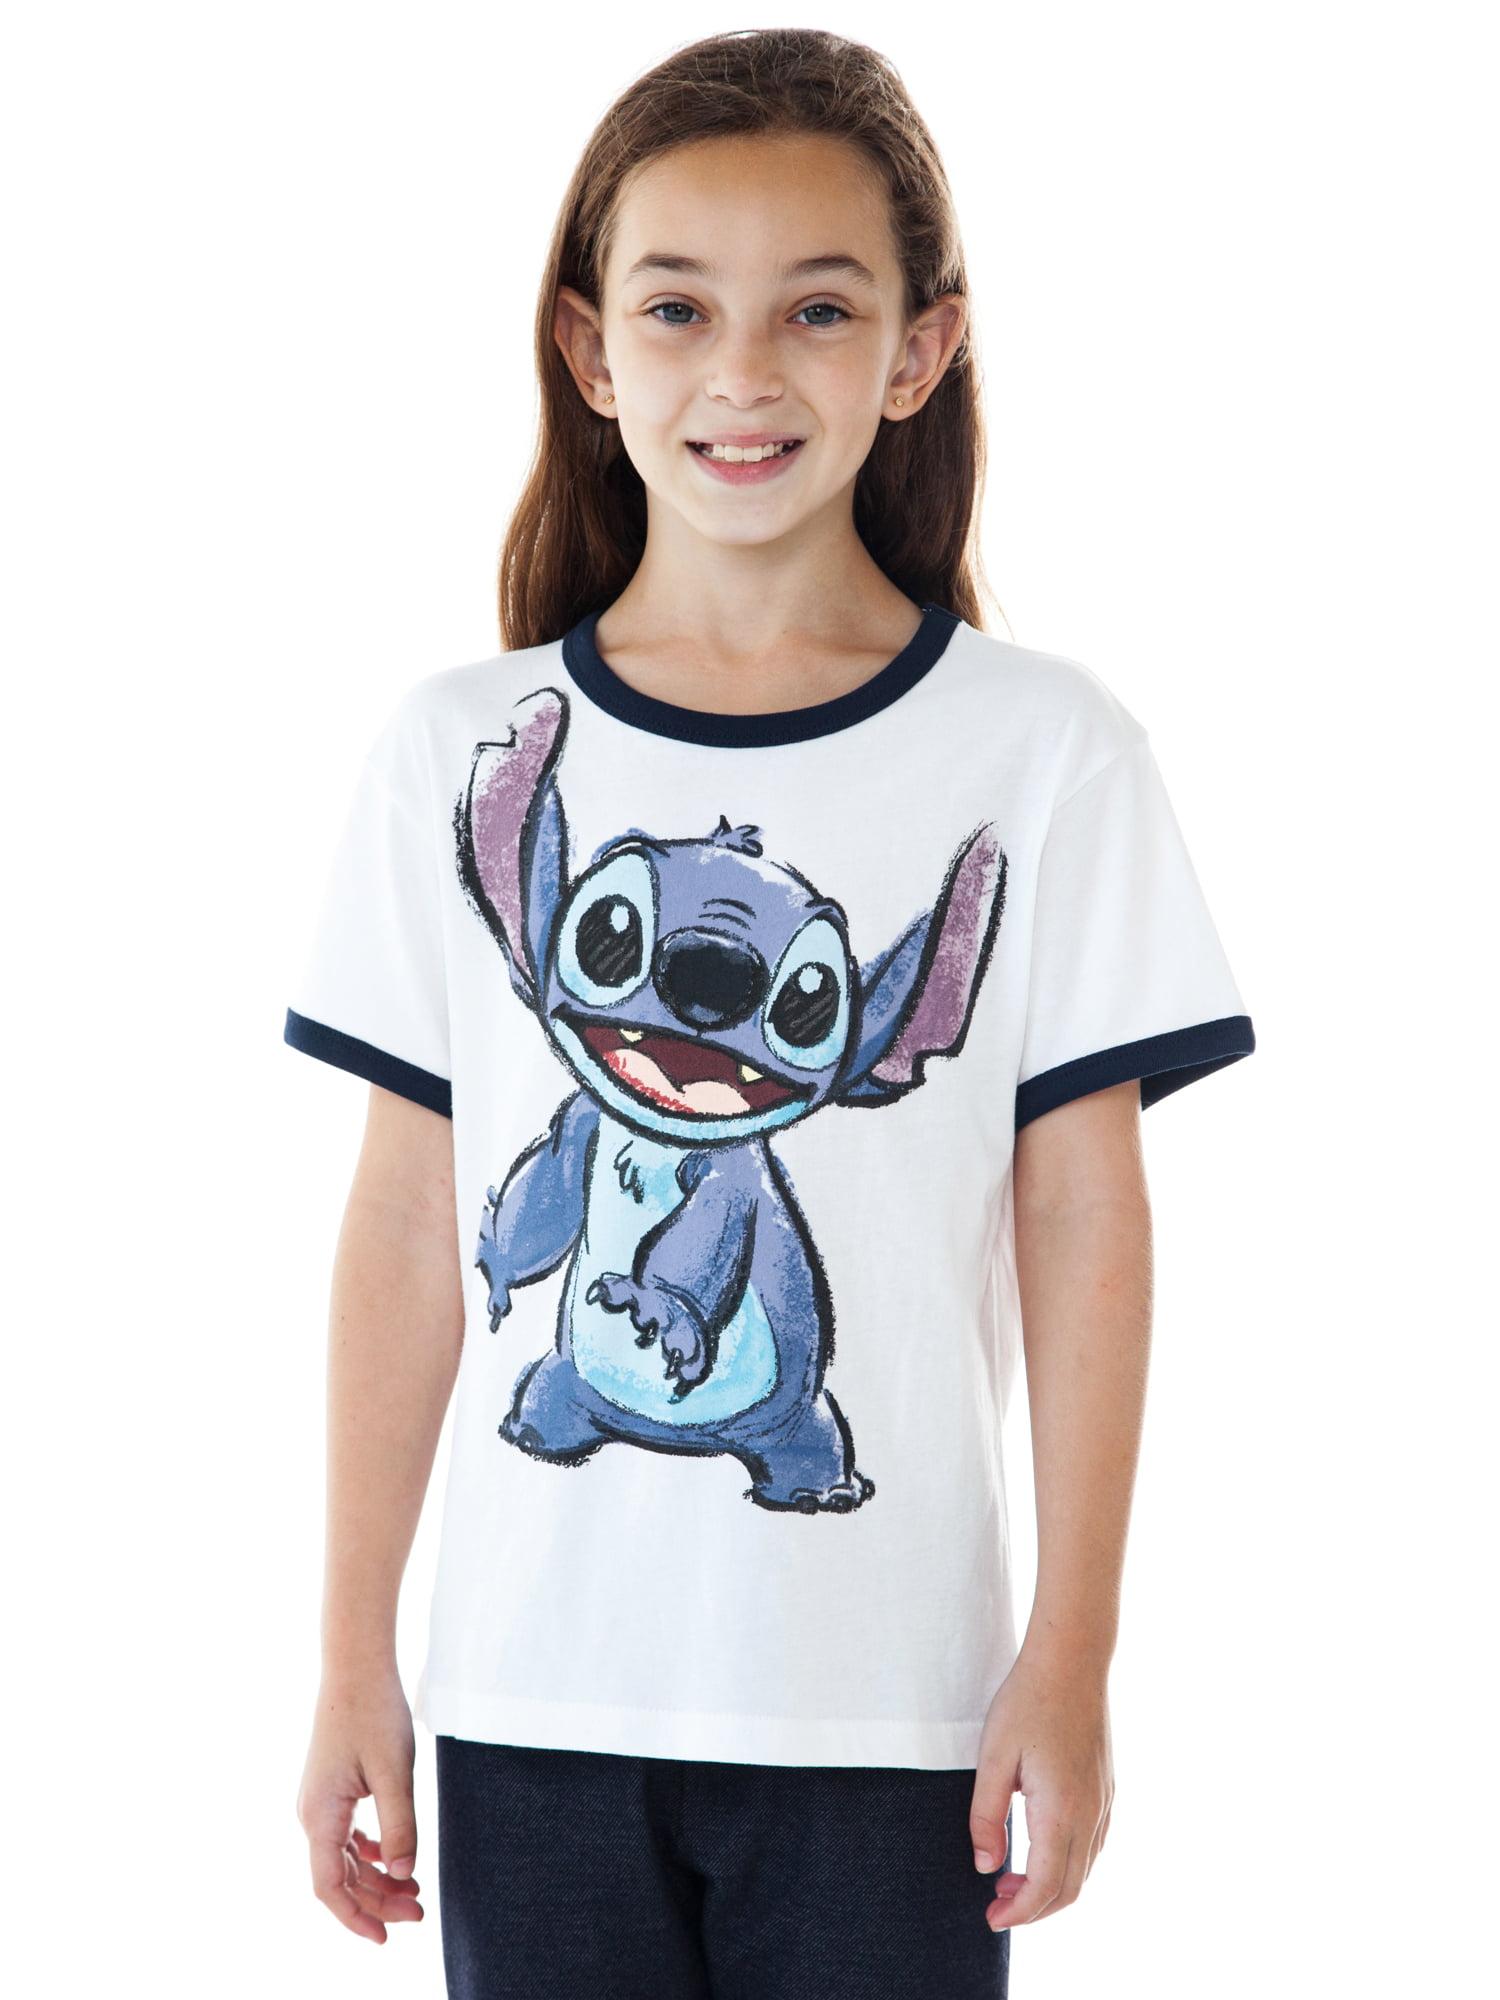 Youth Girls Stitch Ringer Short Sleeve T-Shirt White